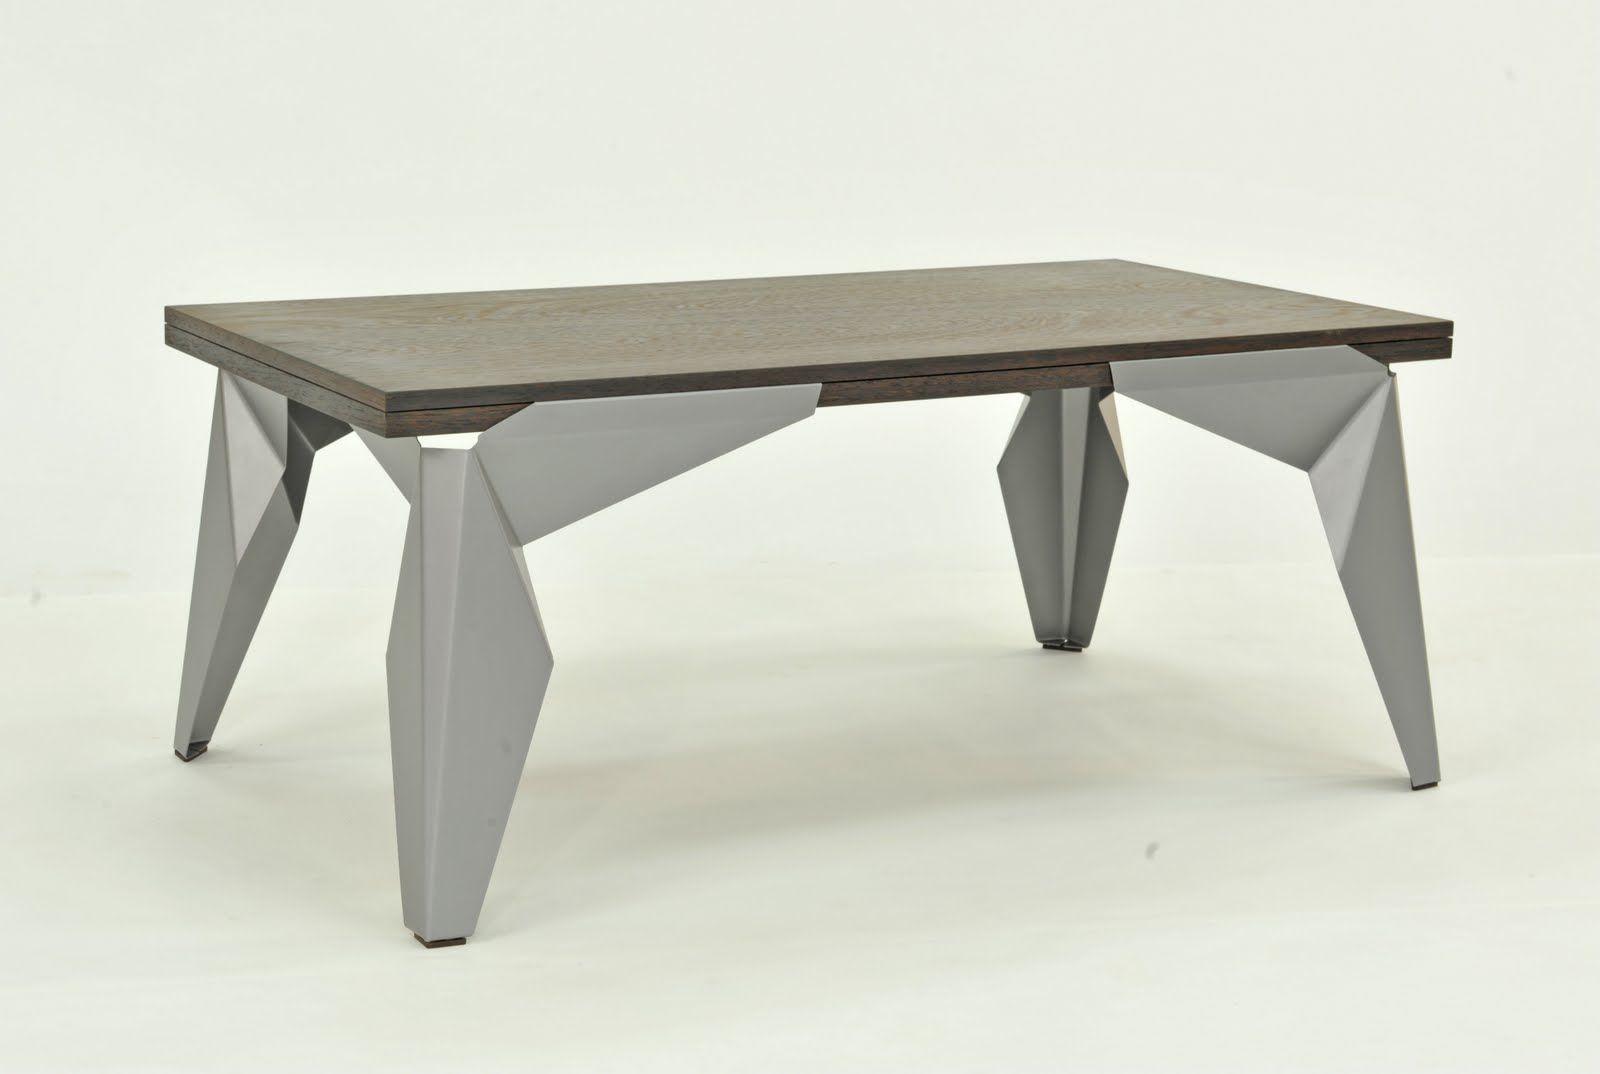 pleasurable cofee table design. Sheet Metal Coffee Table  Furniture Pinterest metal